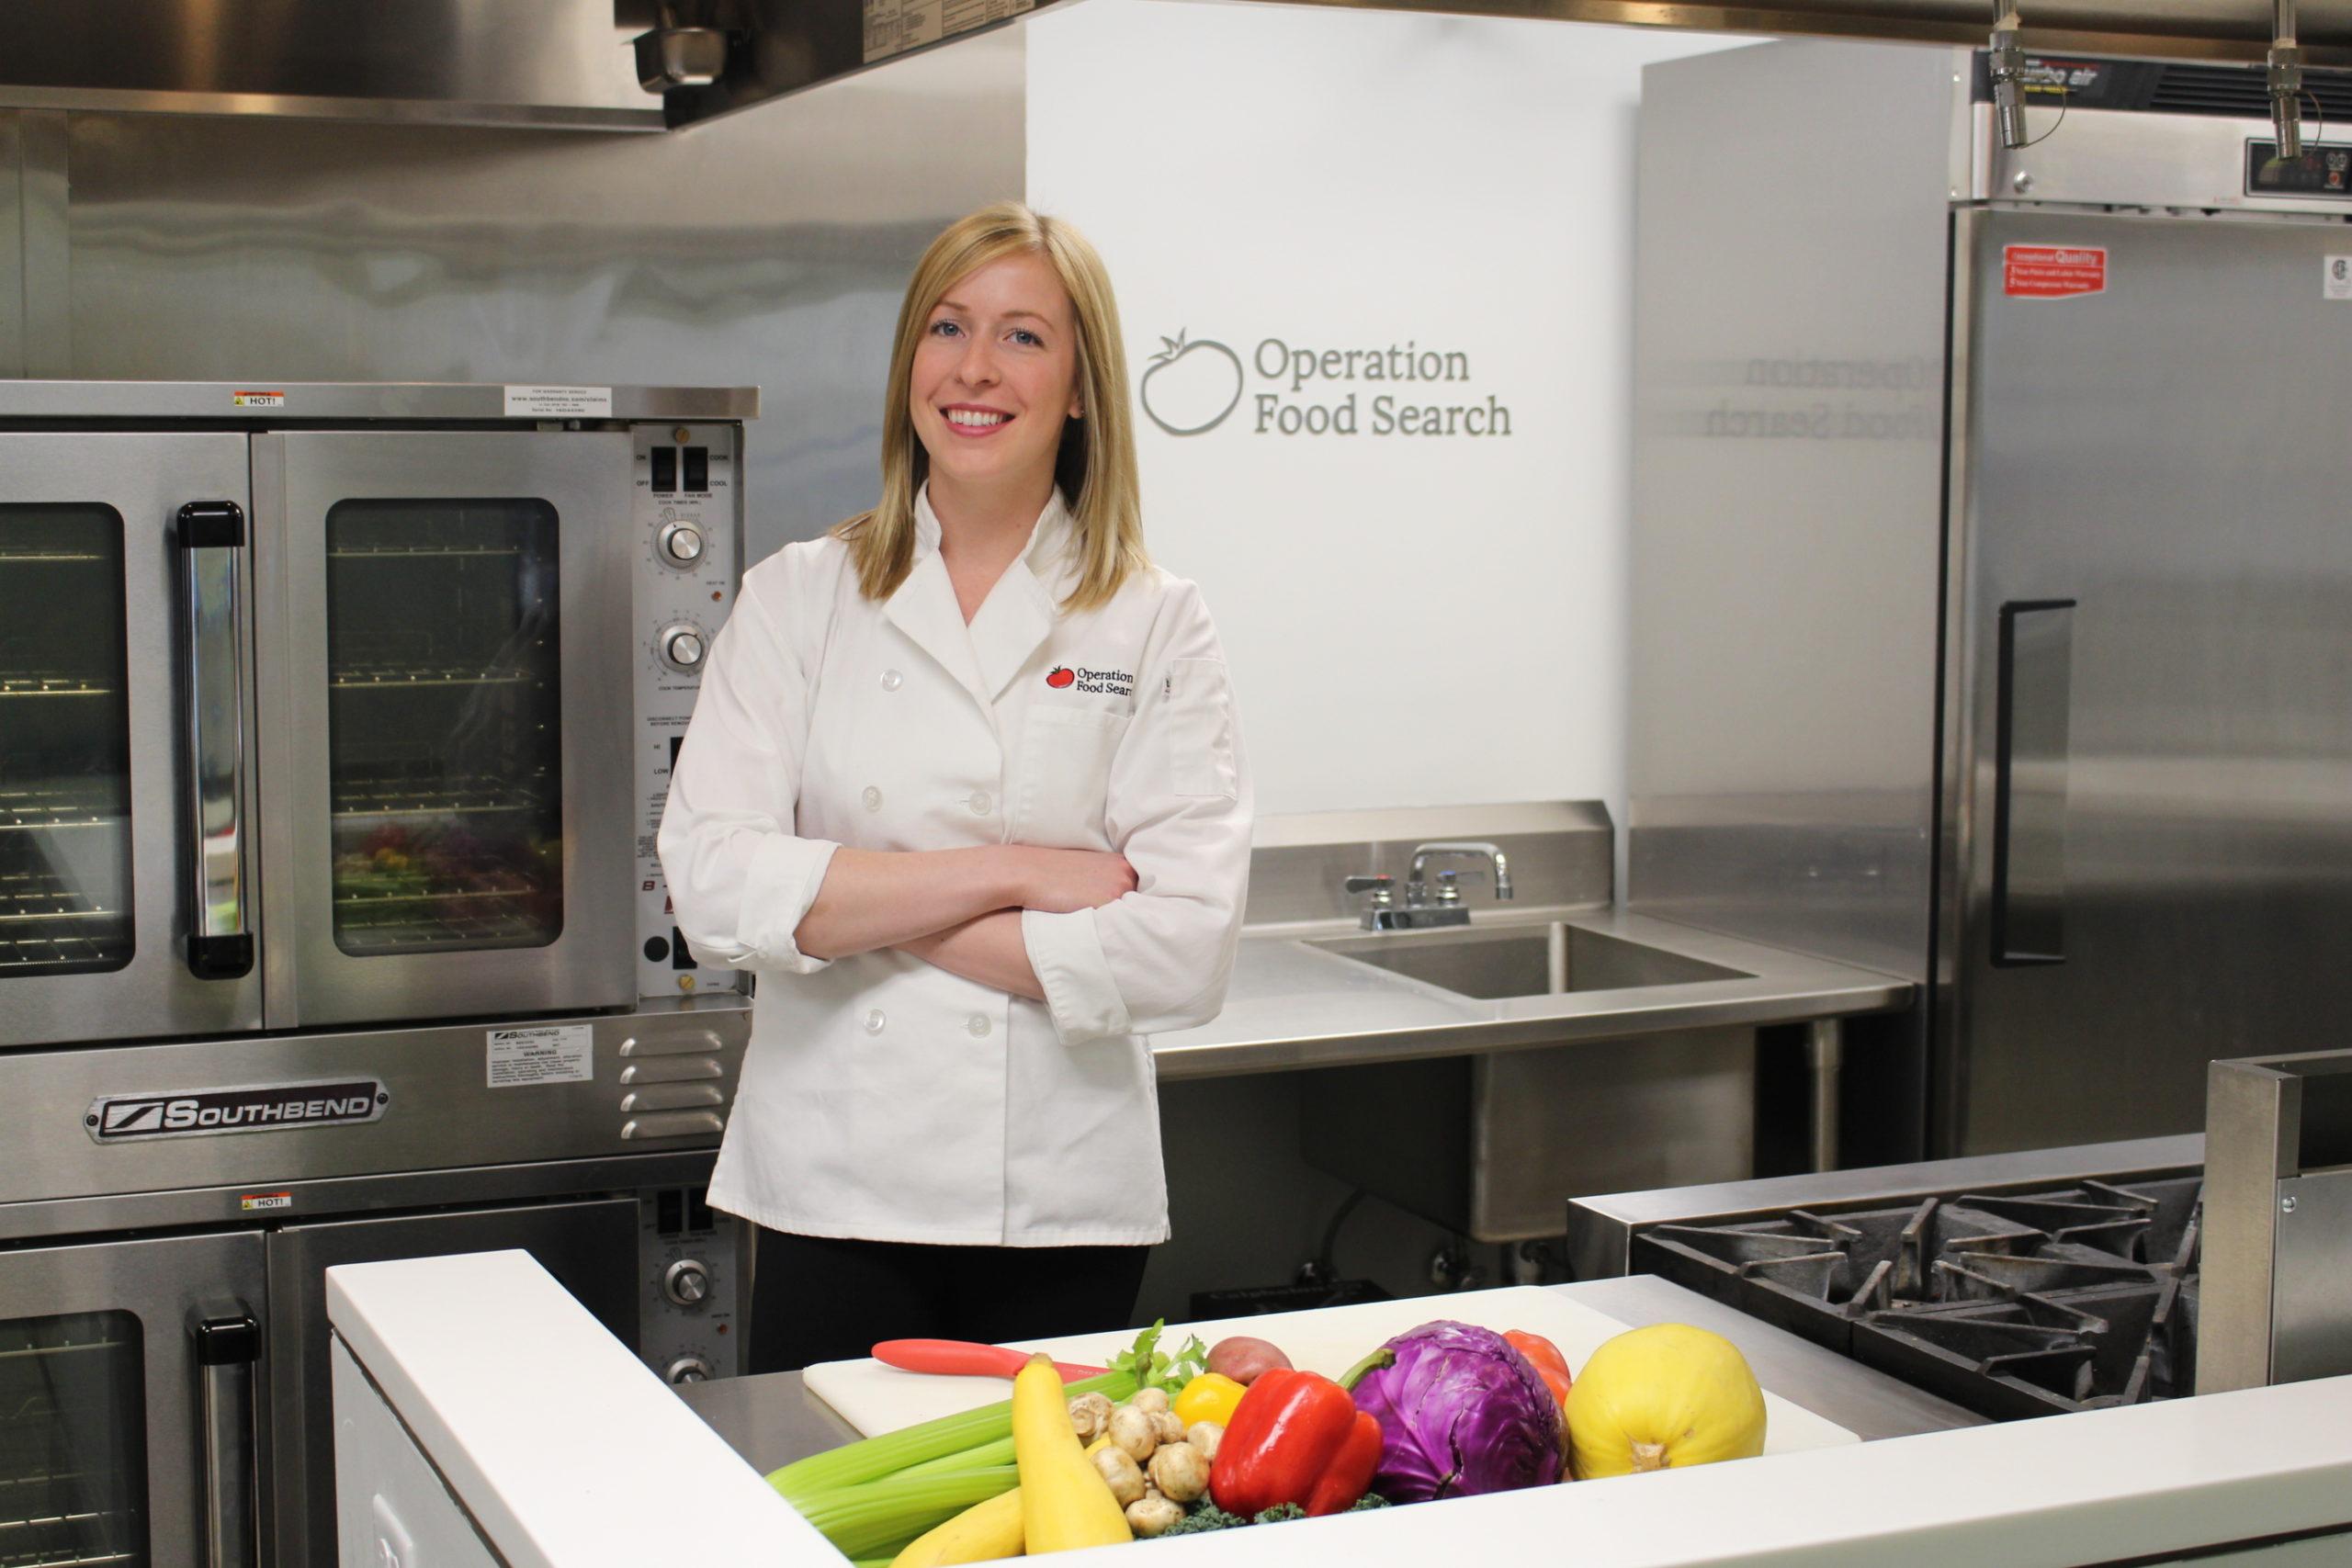 Chef preparing for nutrition education